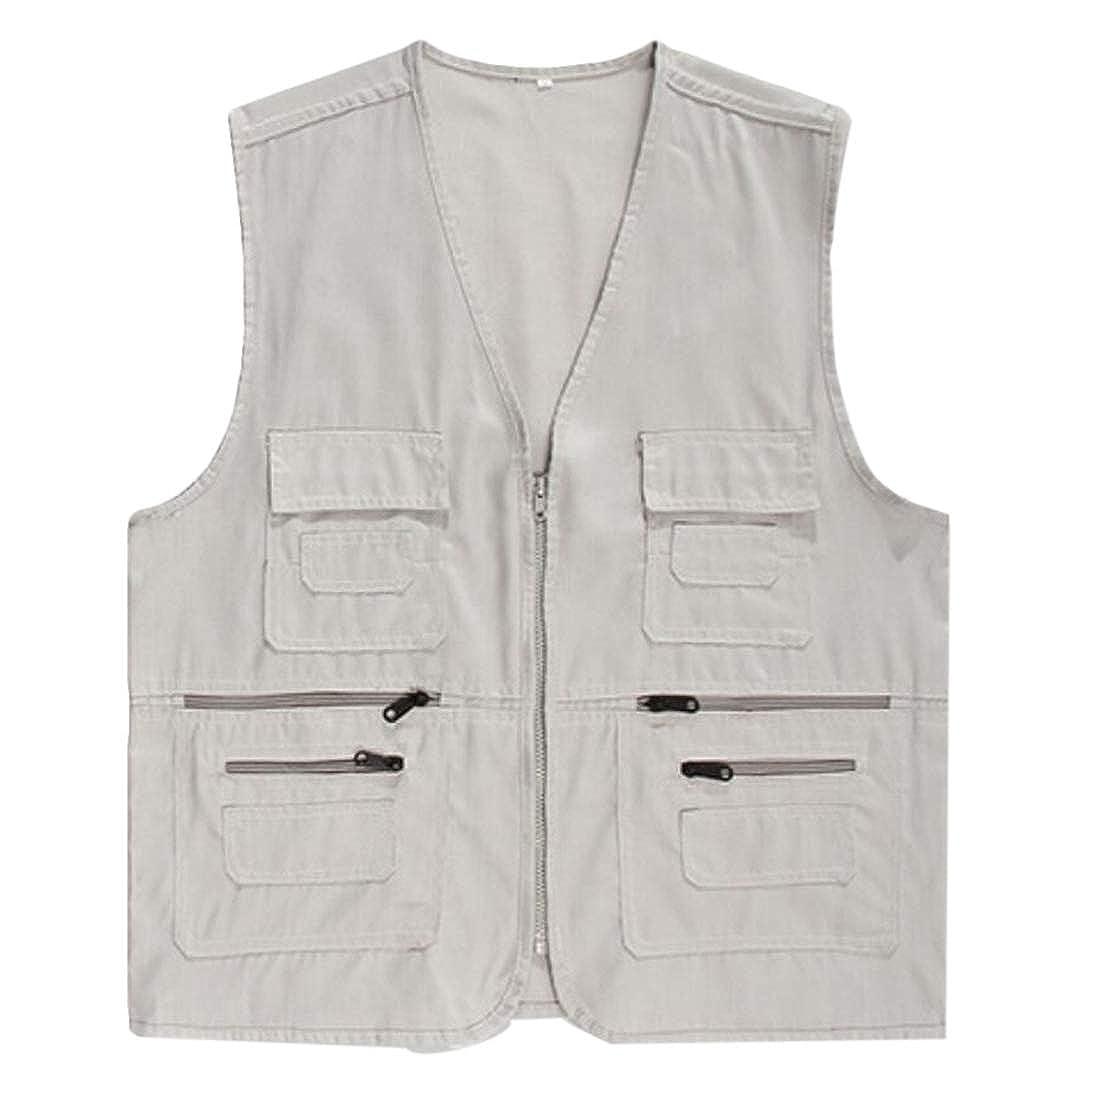 Alion Mens Sleeveless Outdoor Multi-Pockets Work Fishing Hiking Rugged Vest